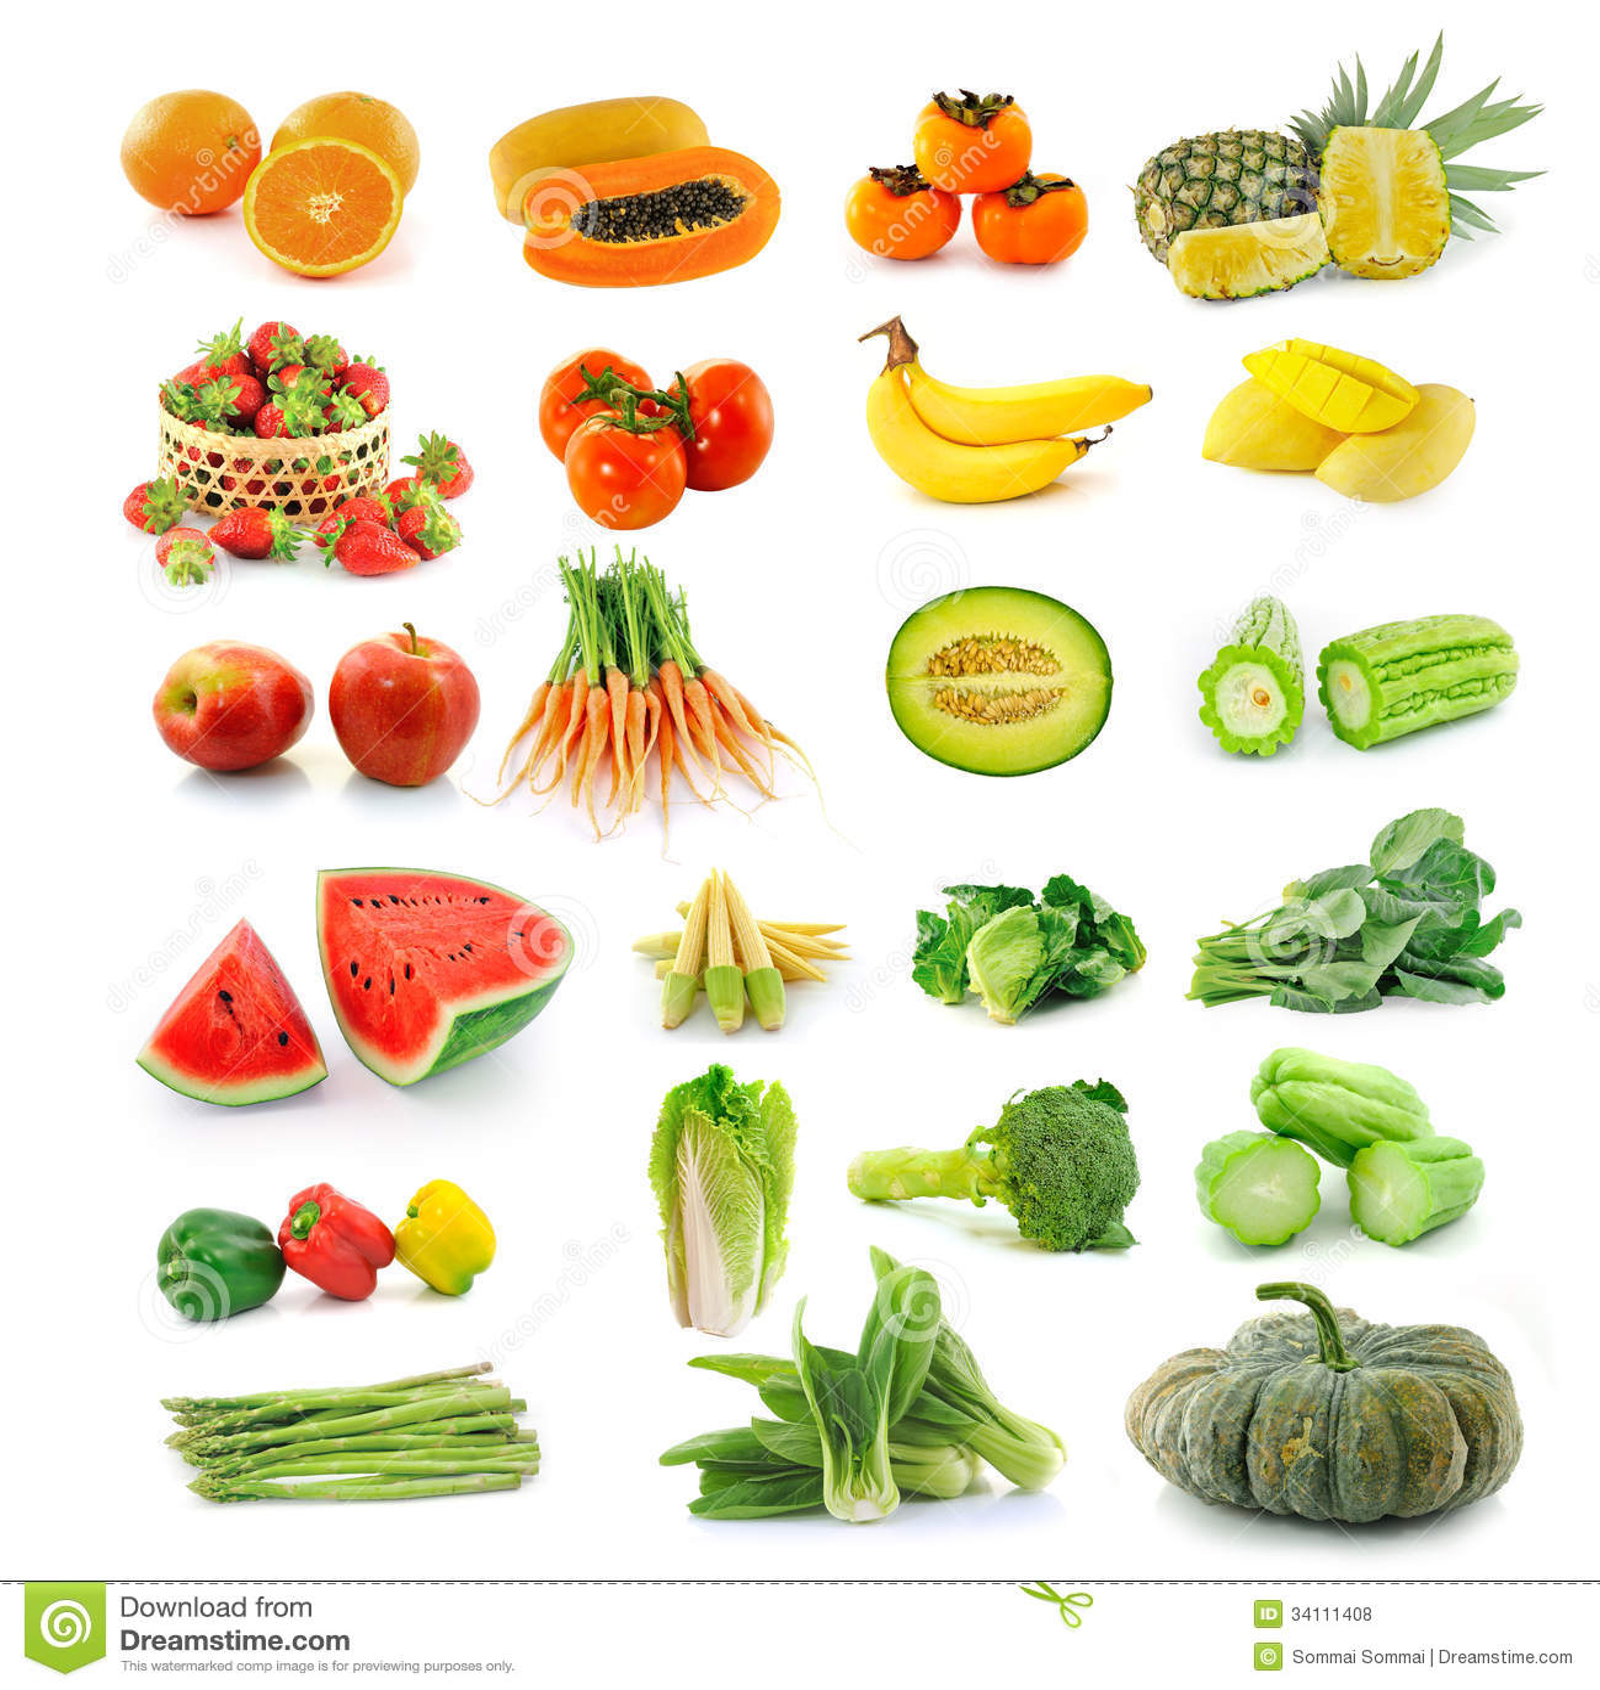 epic raw food pdf free